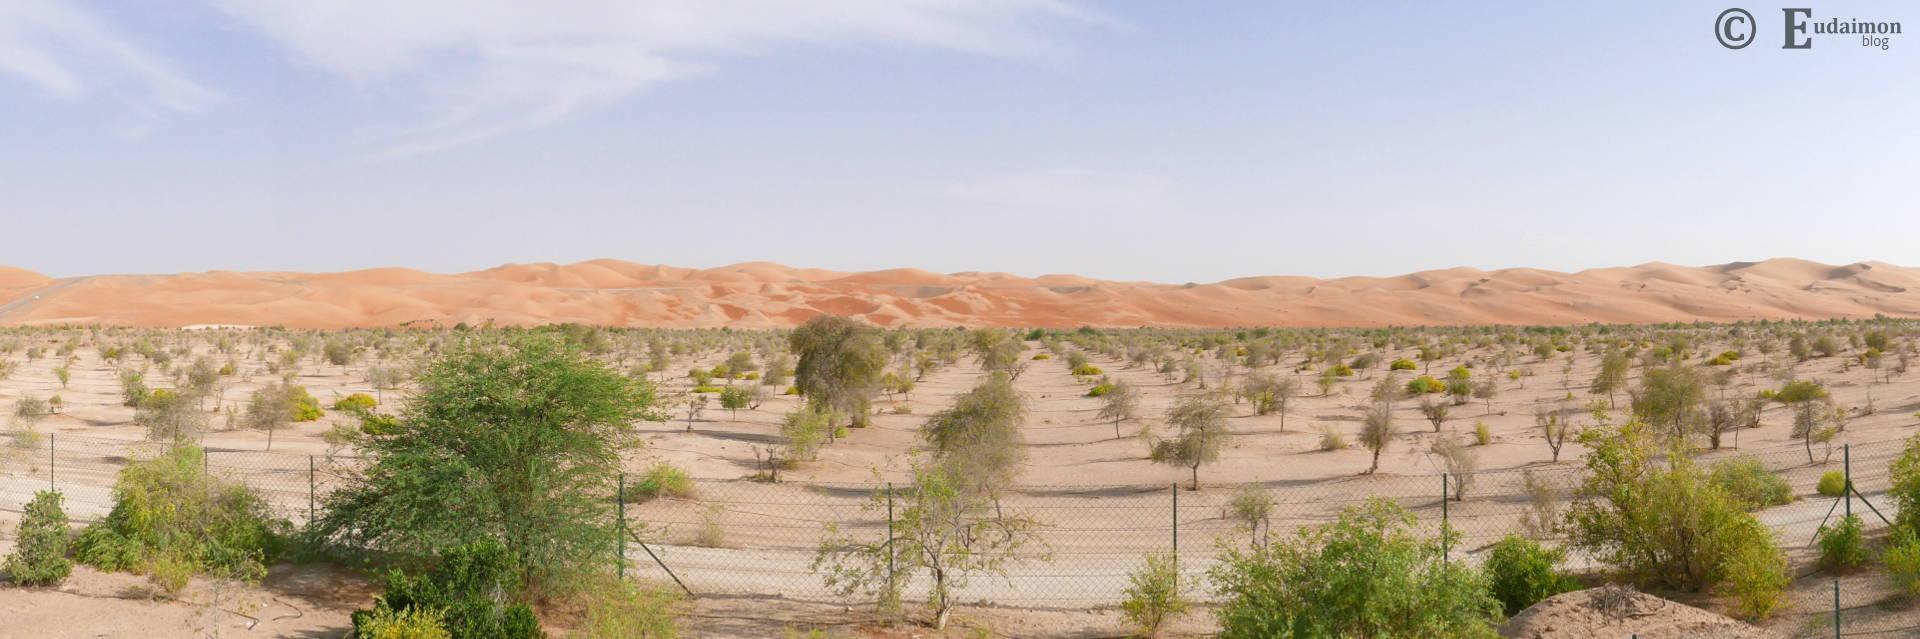 Droga z Abu Dabi do Qasr Al Sarab